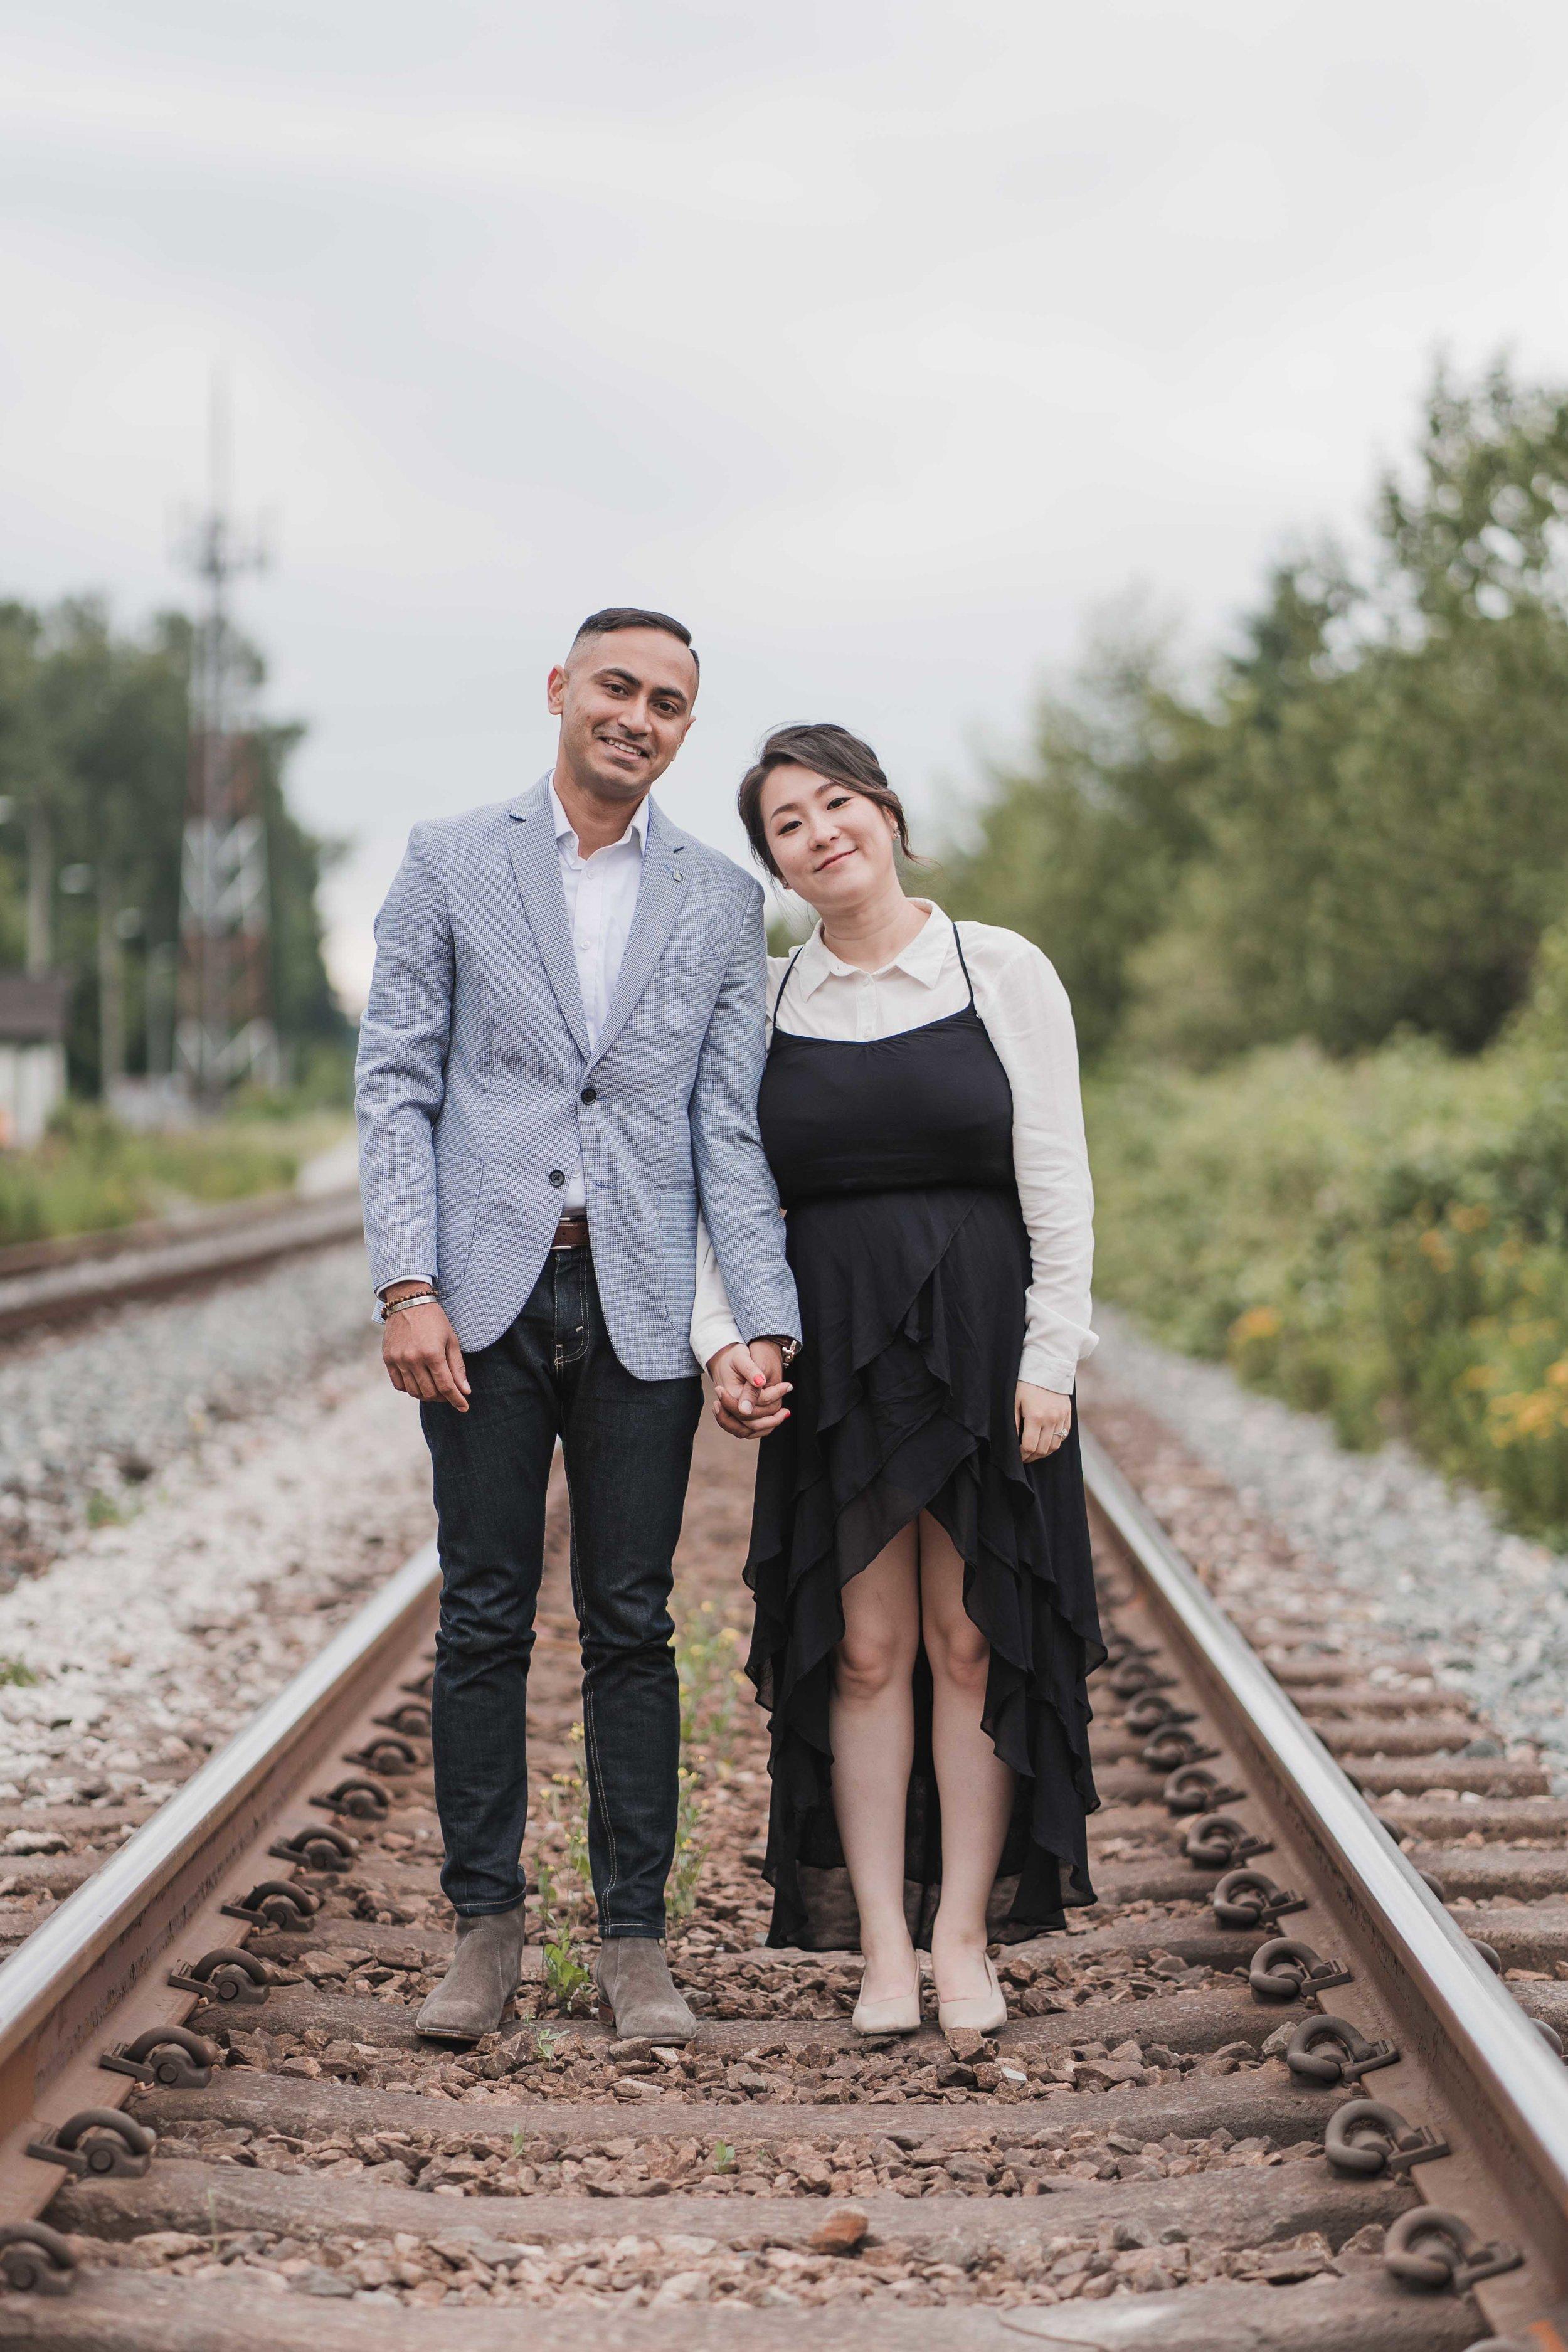 20190622 - Monika & Johnson Engagement - 0195.jpg